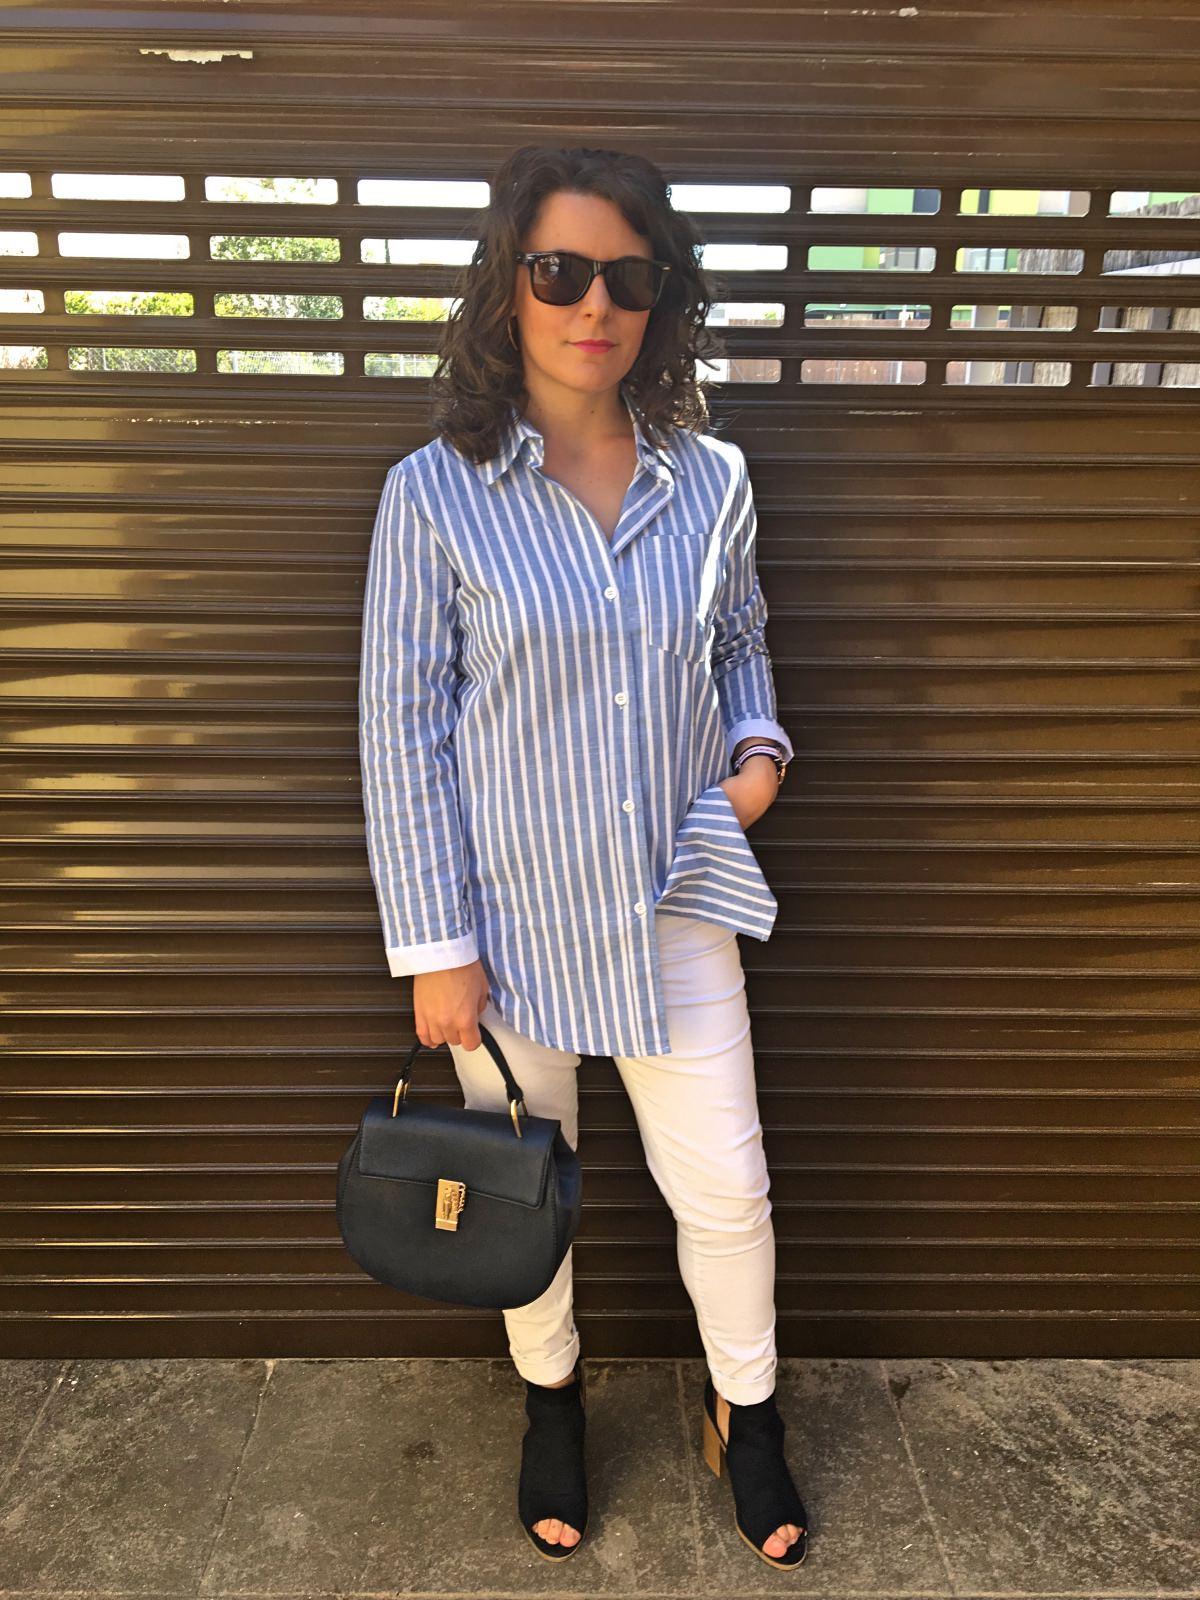 look_blusaderayas_fashionblogger_mivestidoazul-com_influencer_blogdemoda_castellonmg_1845